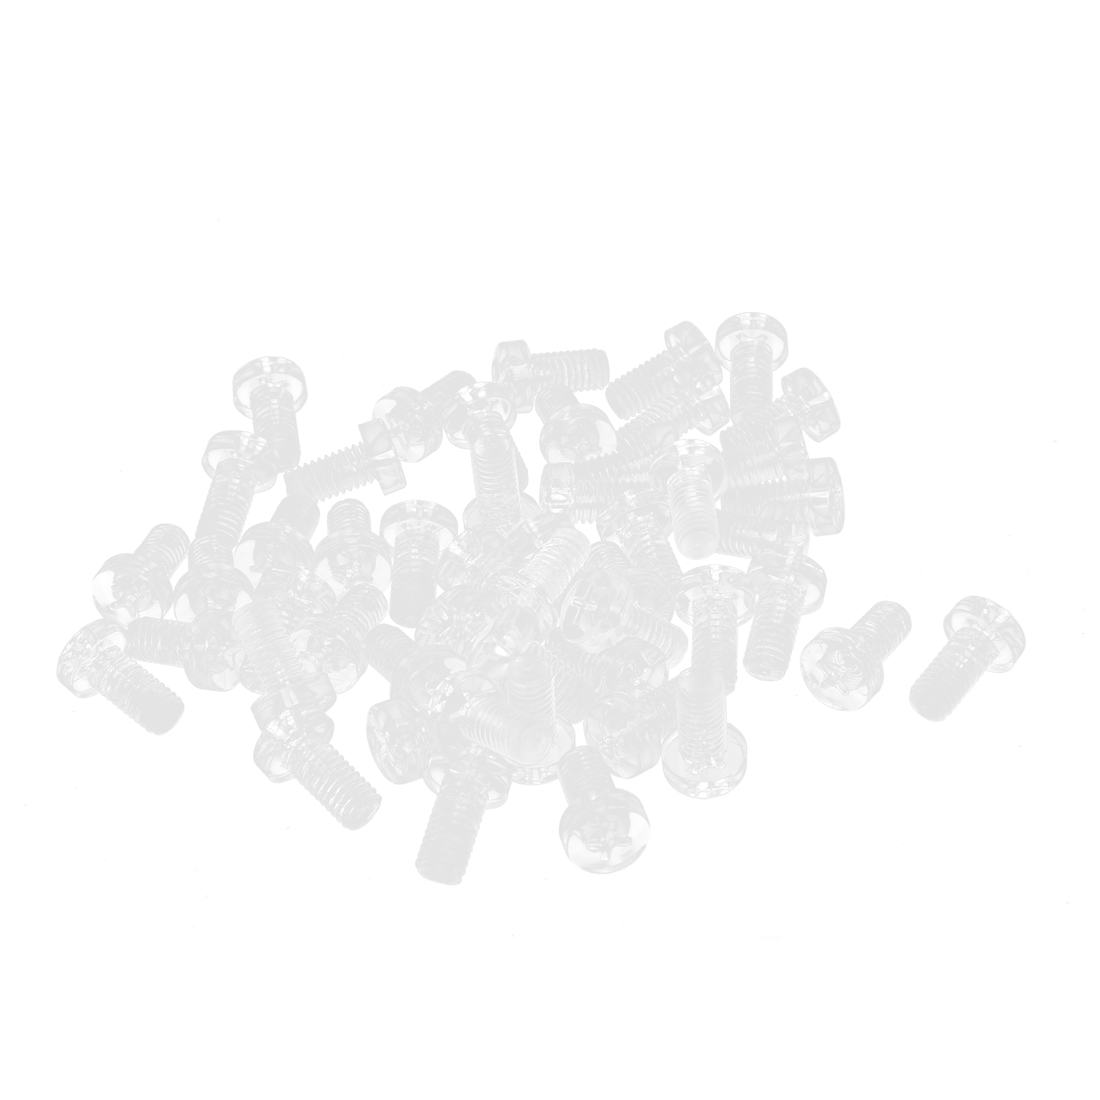 M6 x 12mm 1mm Pitch Phillips Pan Head Machine Screw Bolt Clear 50 Pcs